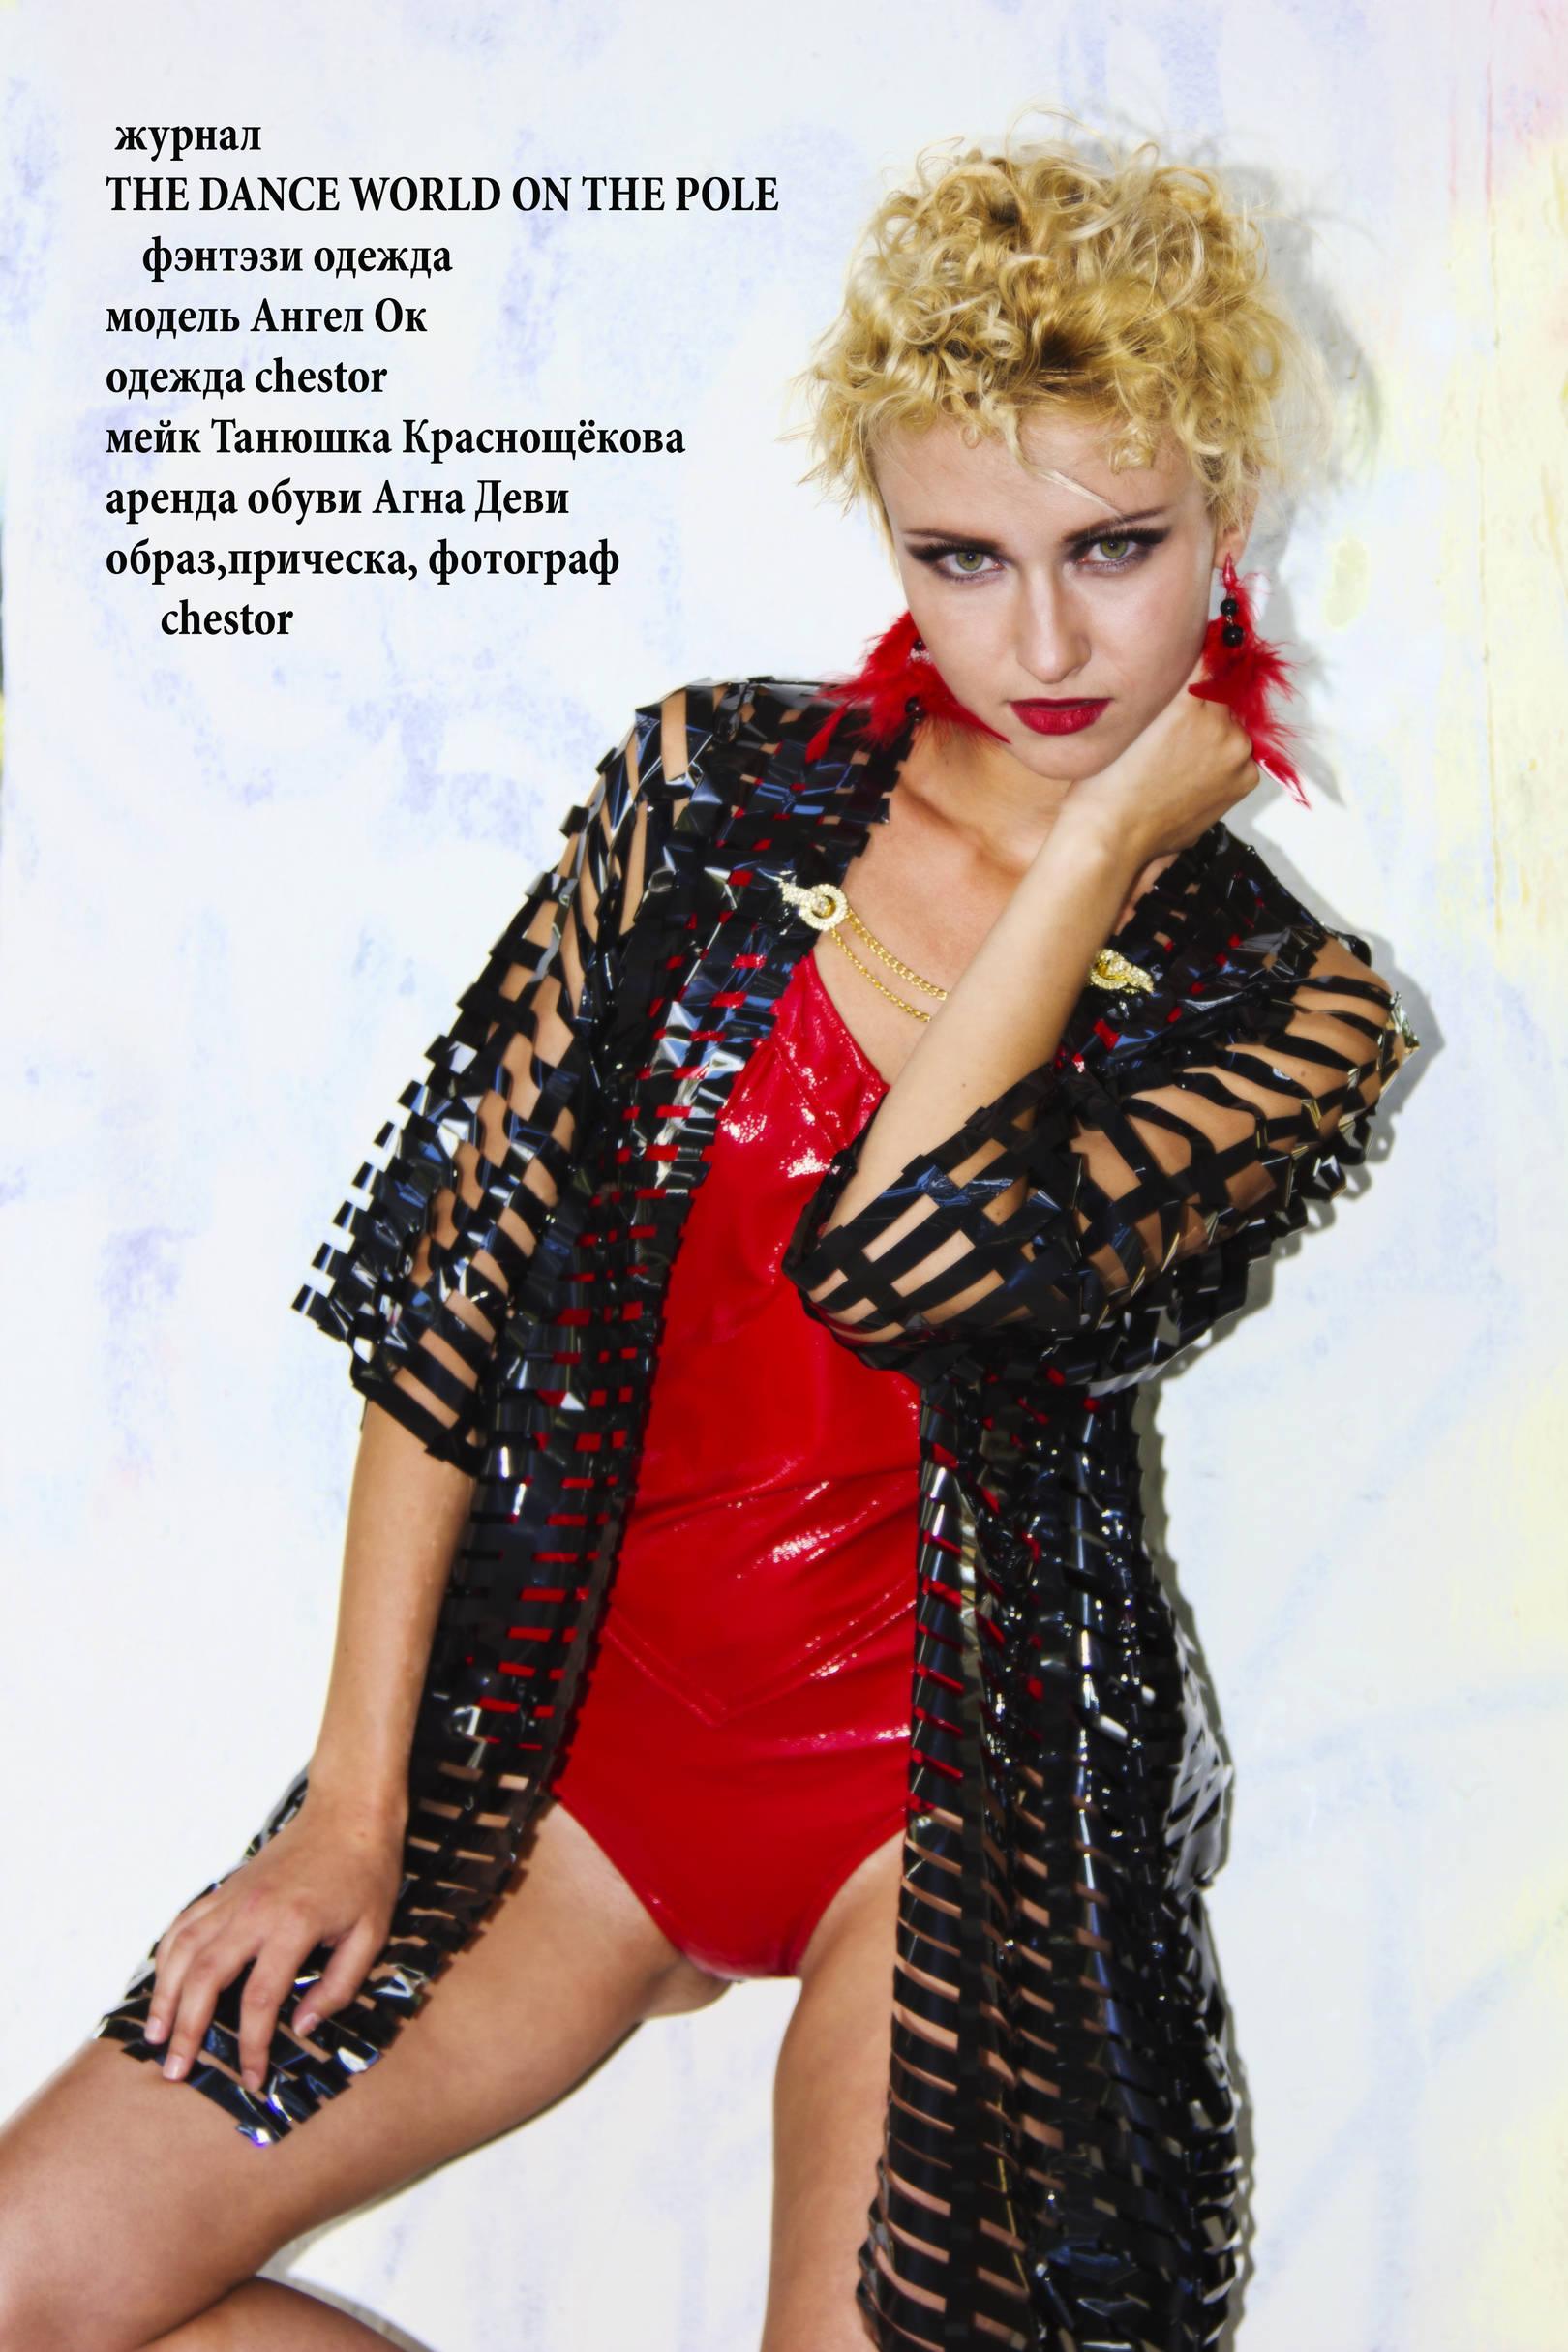 журнал THE DANCE WORLD ON THE POLE     фэнтэзи одежда